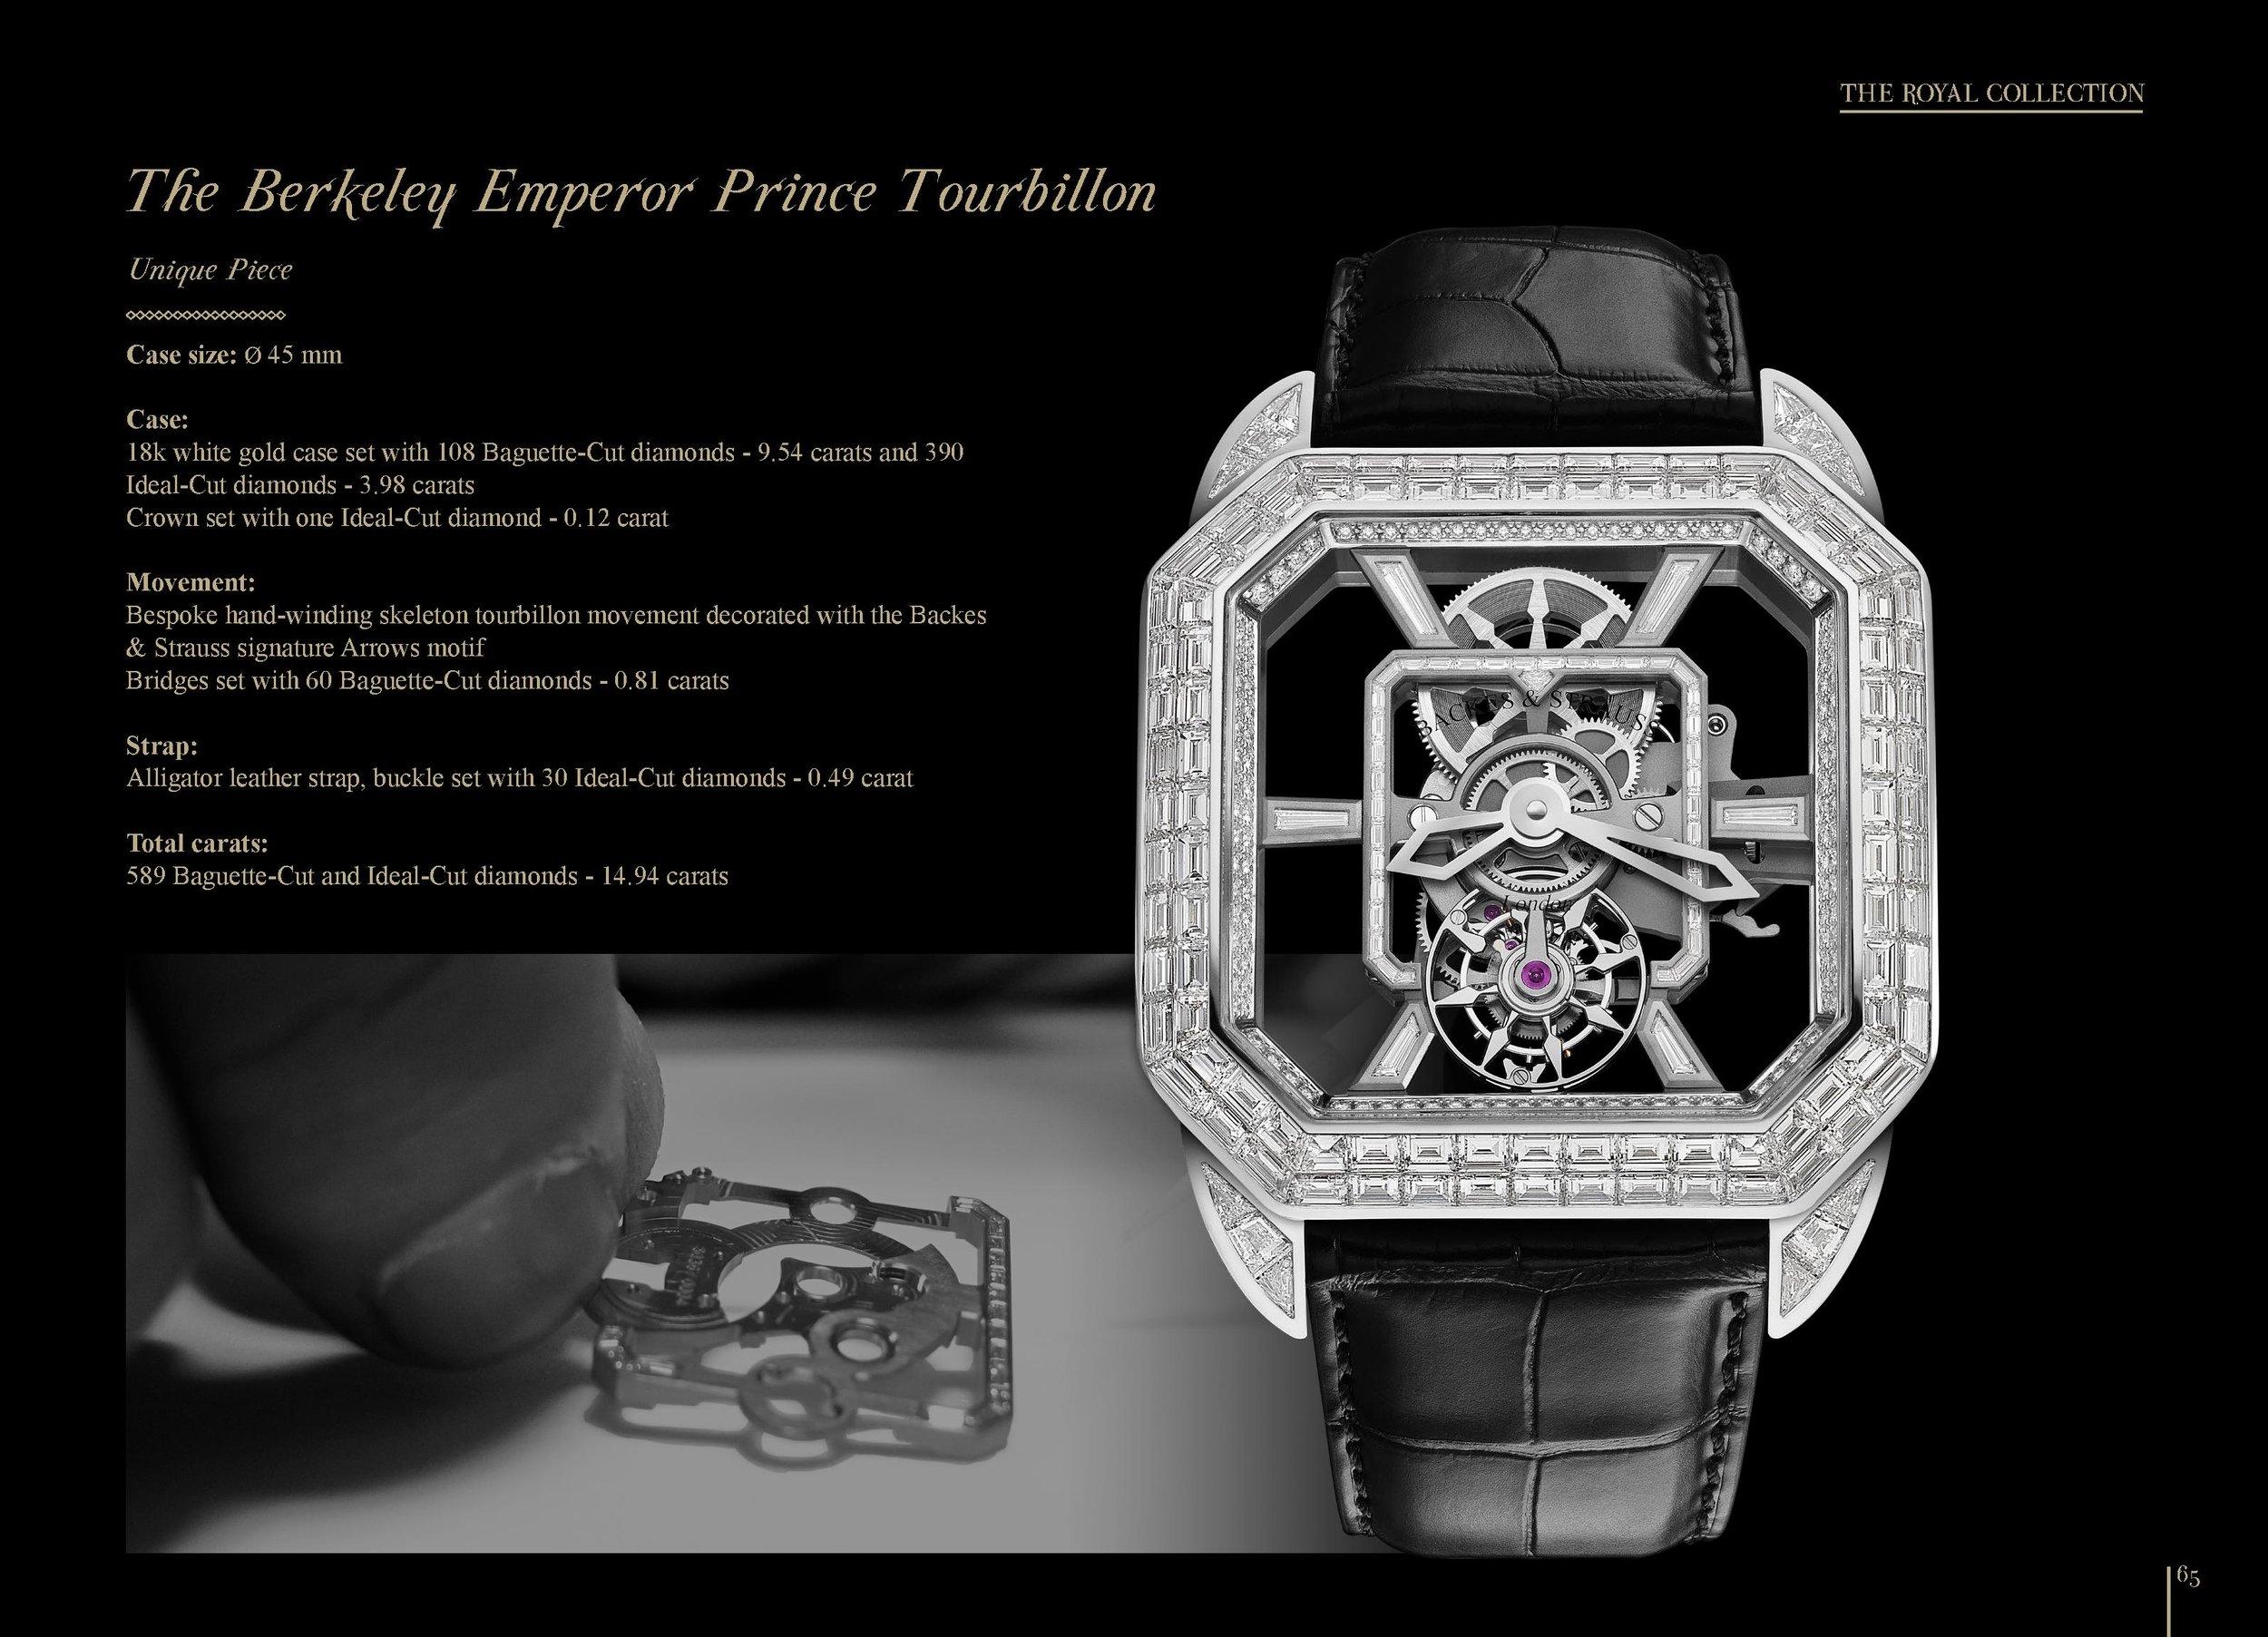 The Berkeley Emperor Prince Tourbillon 45 diamond watch